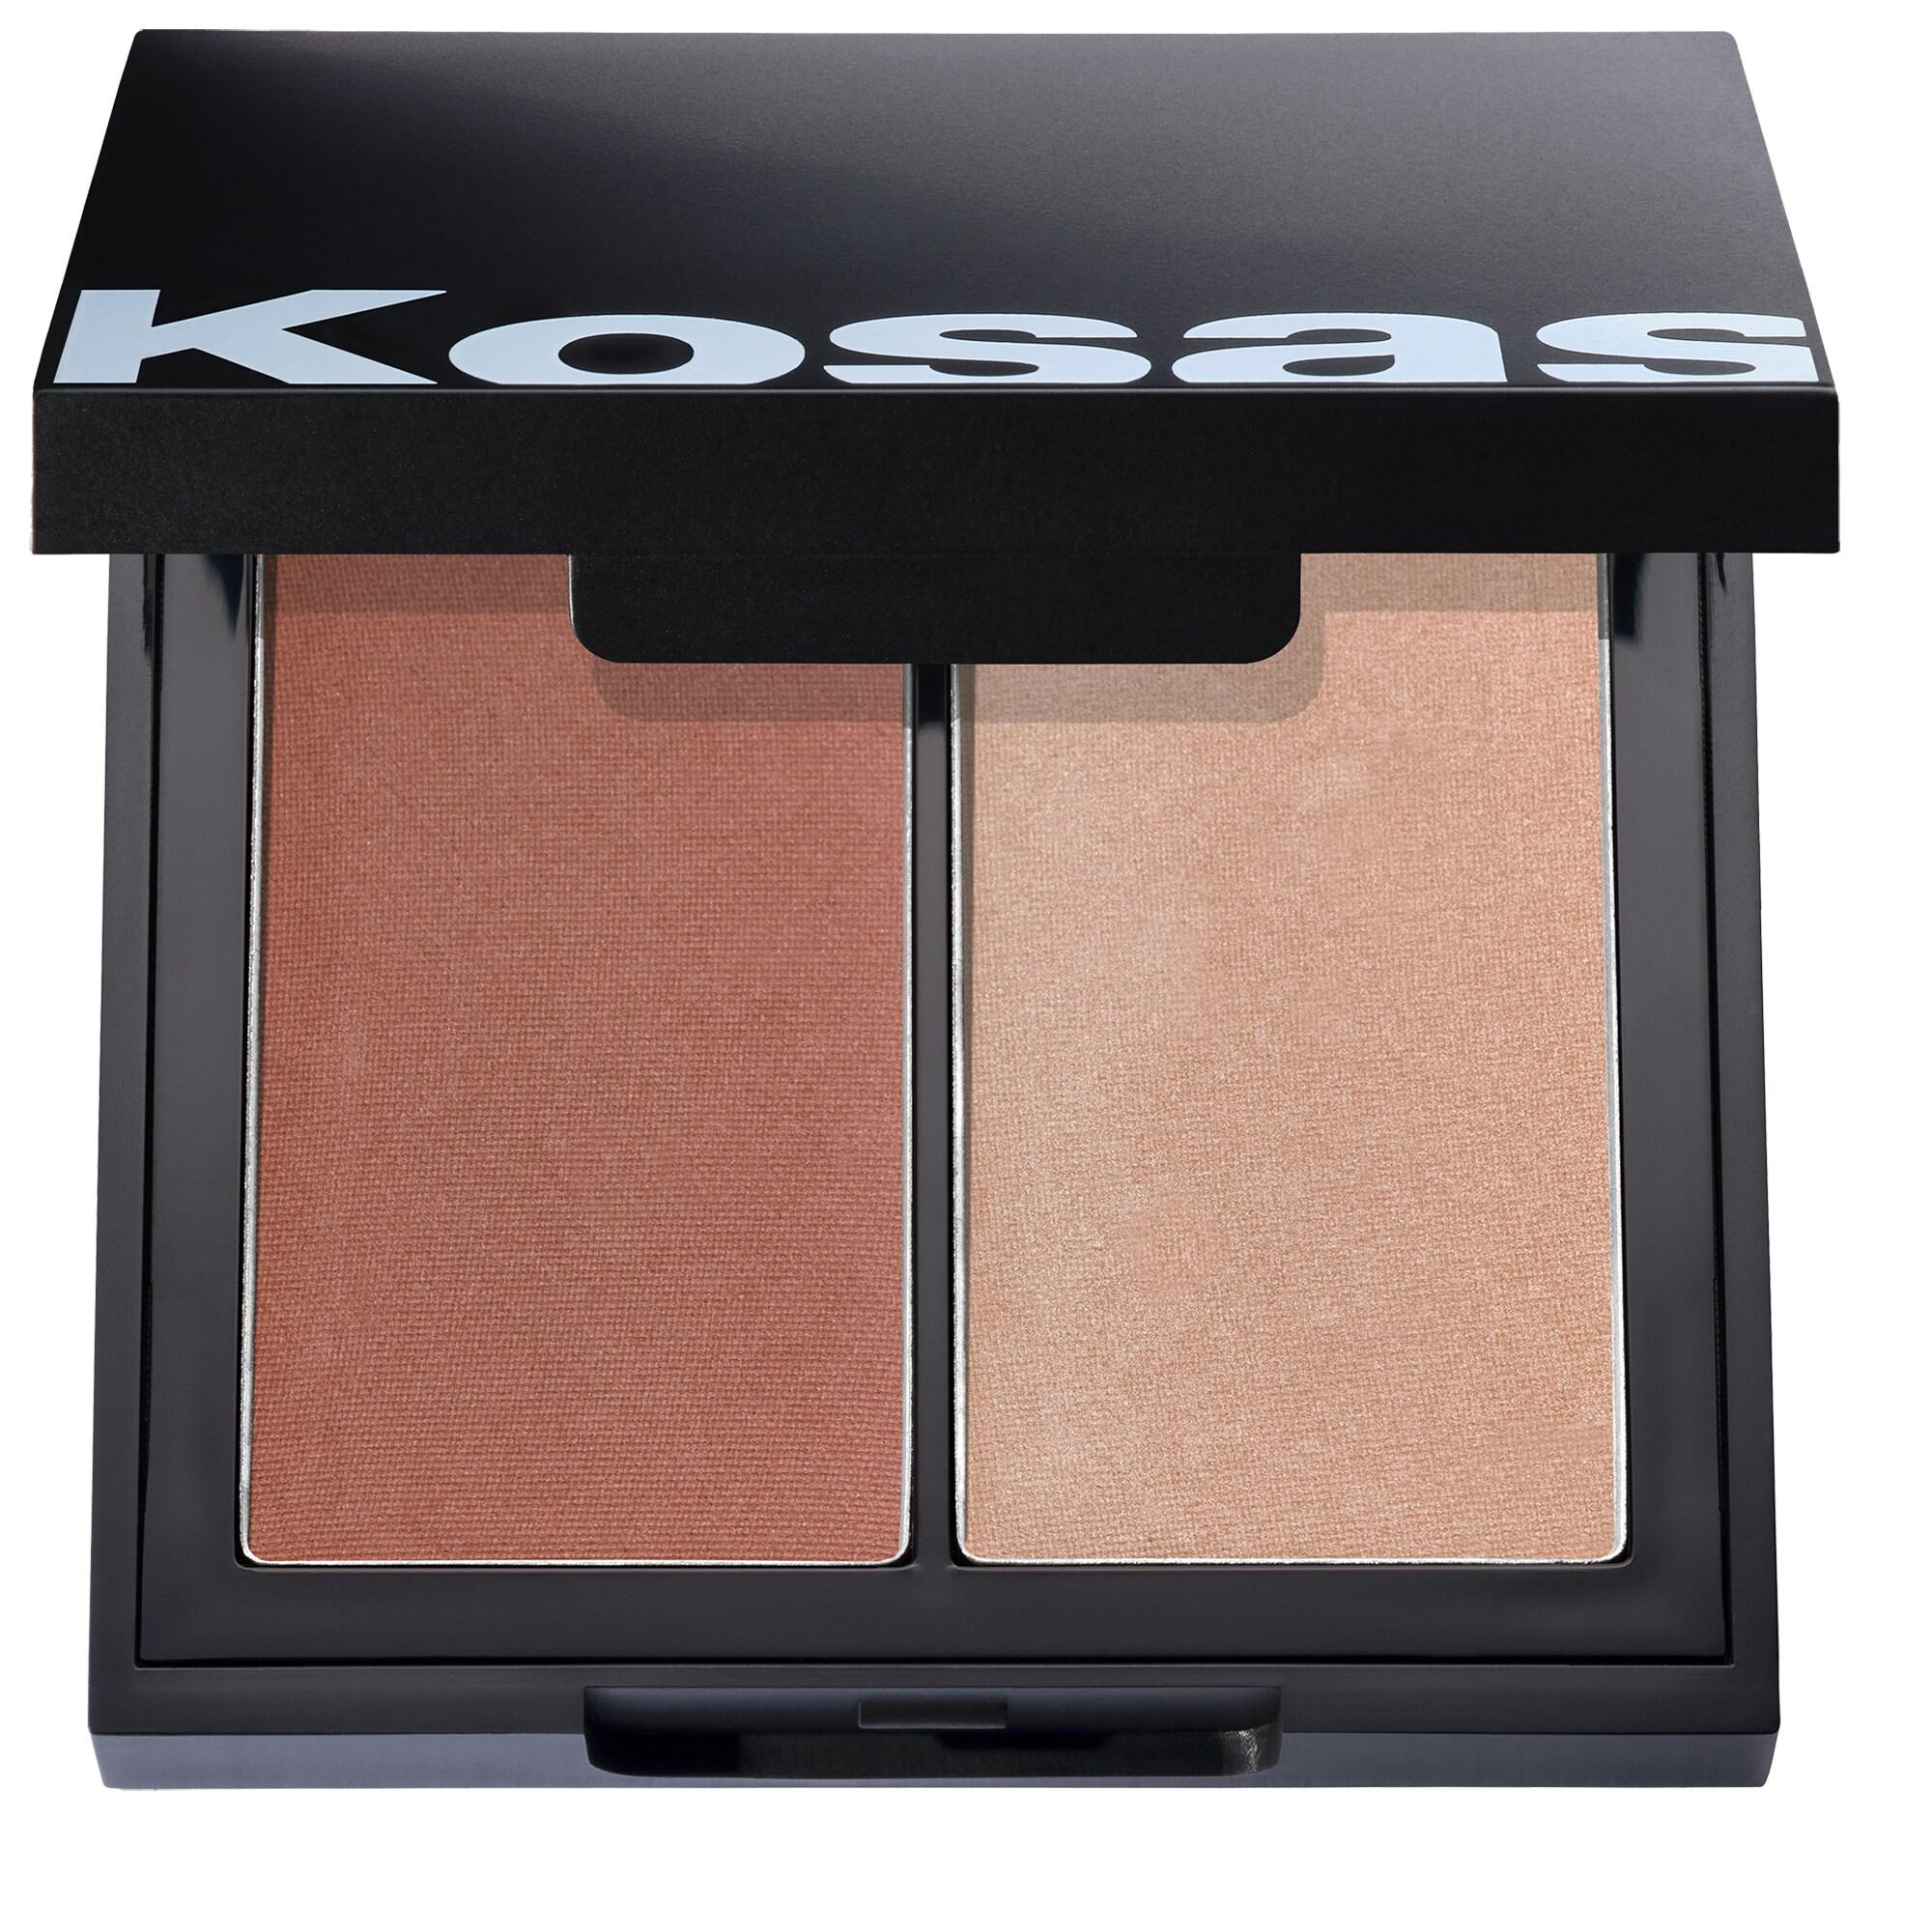 Kosas - Color & Light: Pressed Powder Blush & Highlighter Duo